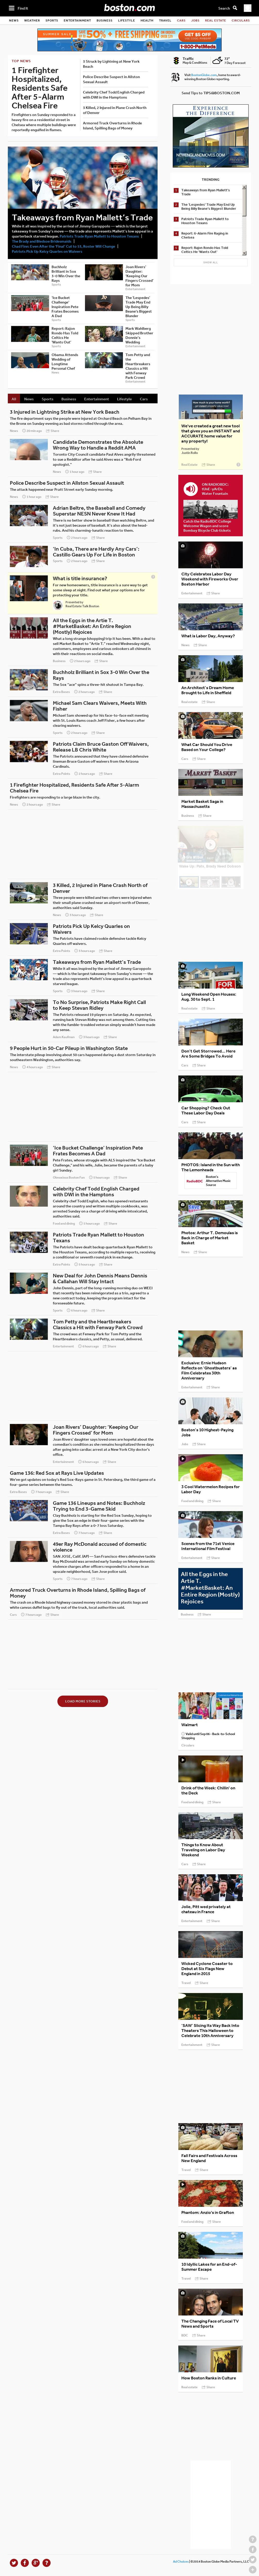 Boston.com at Sunday Aug. 31, 2014, 11:01 p.m. UTC